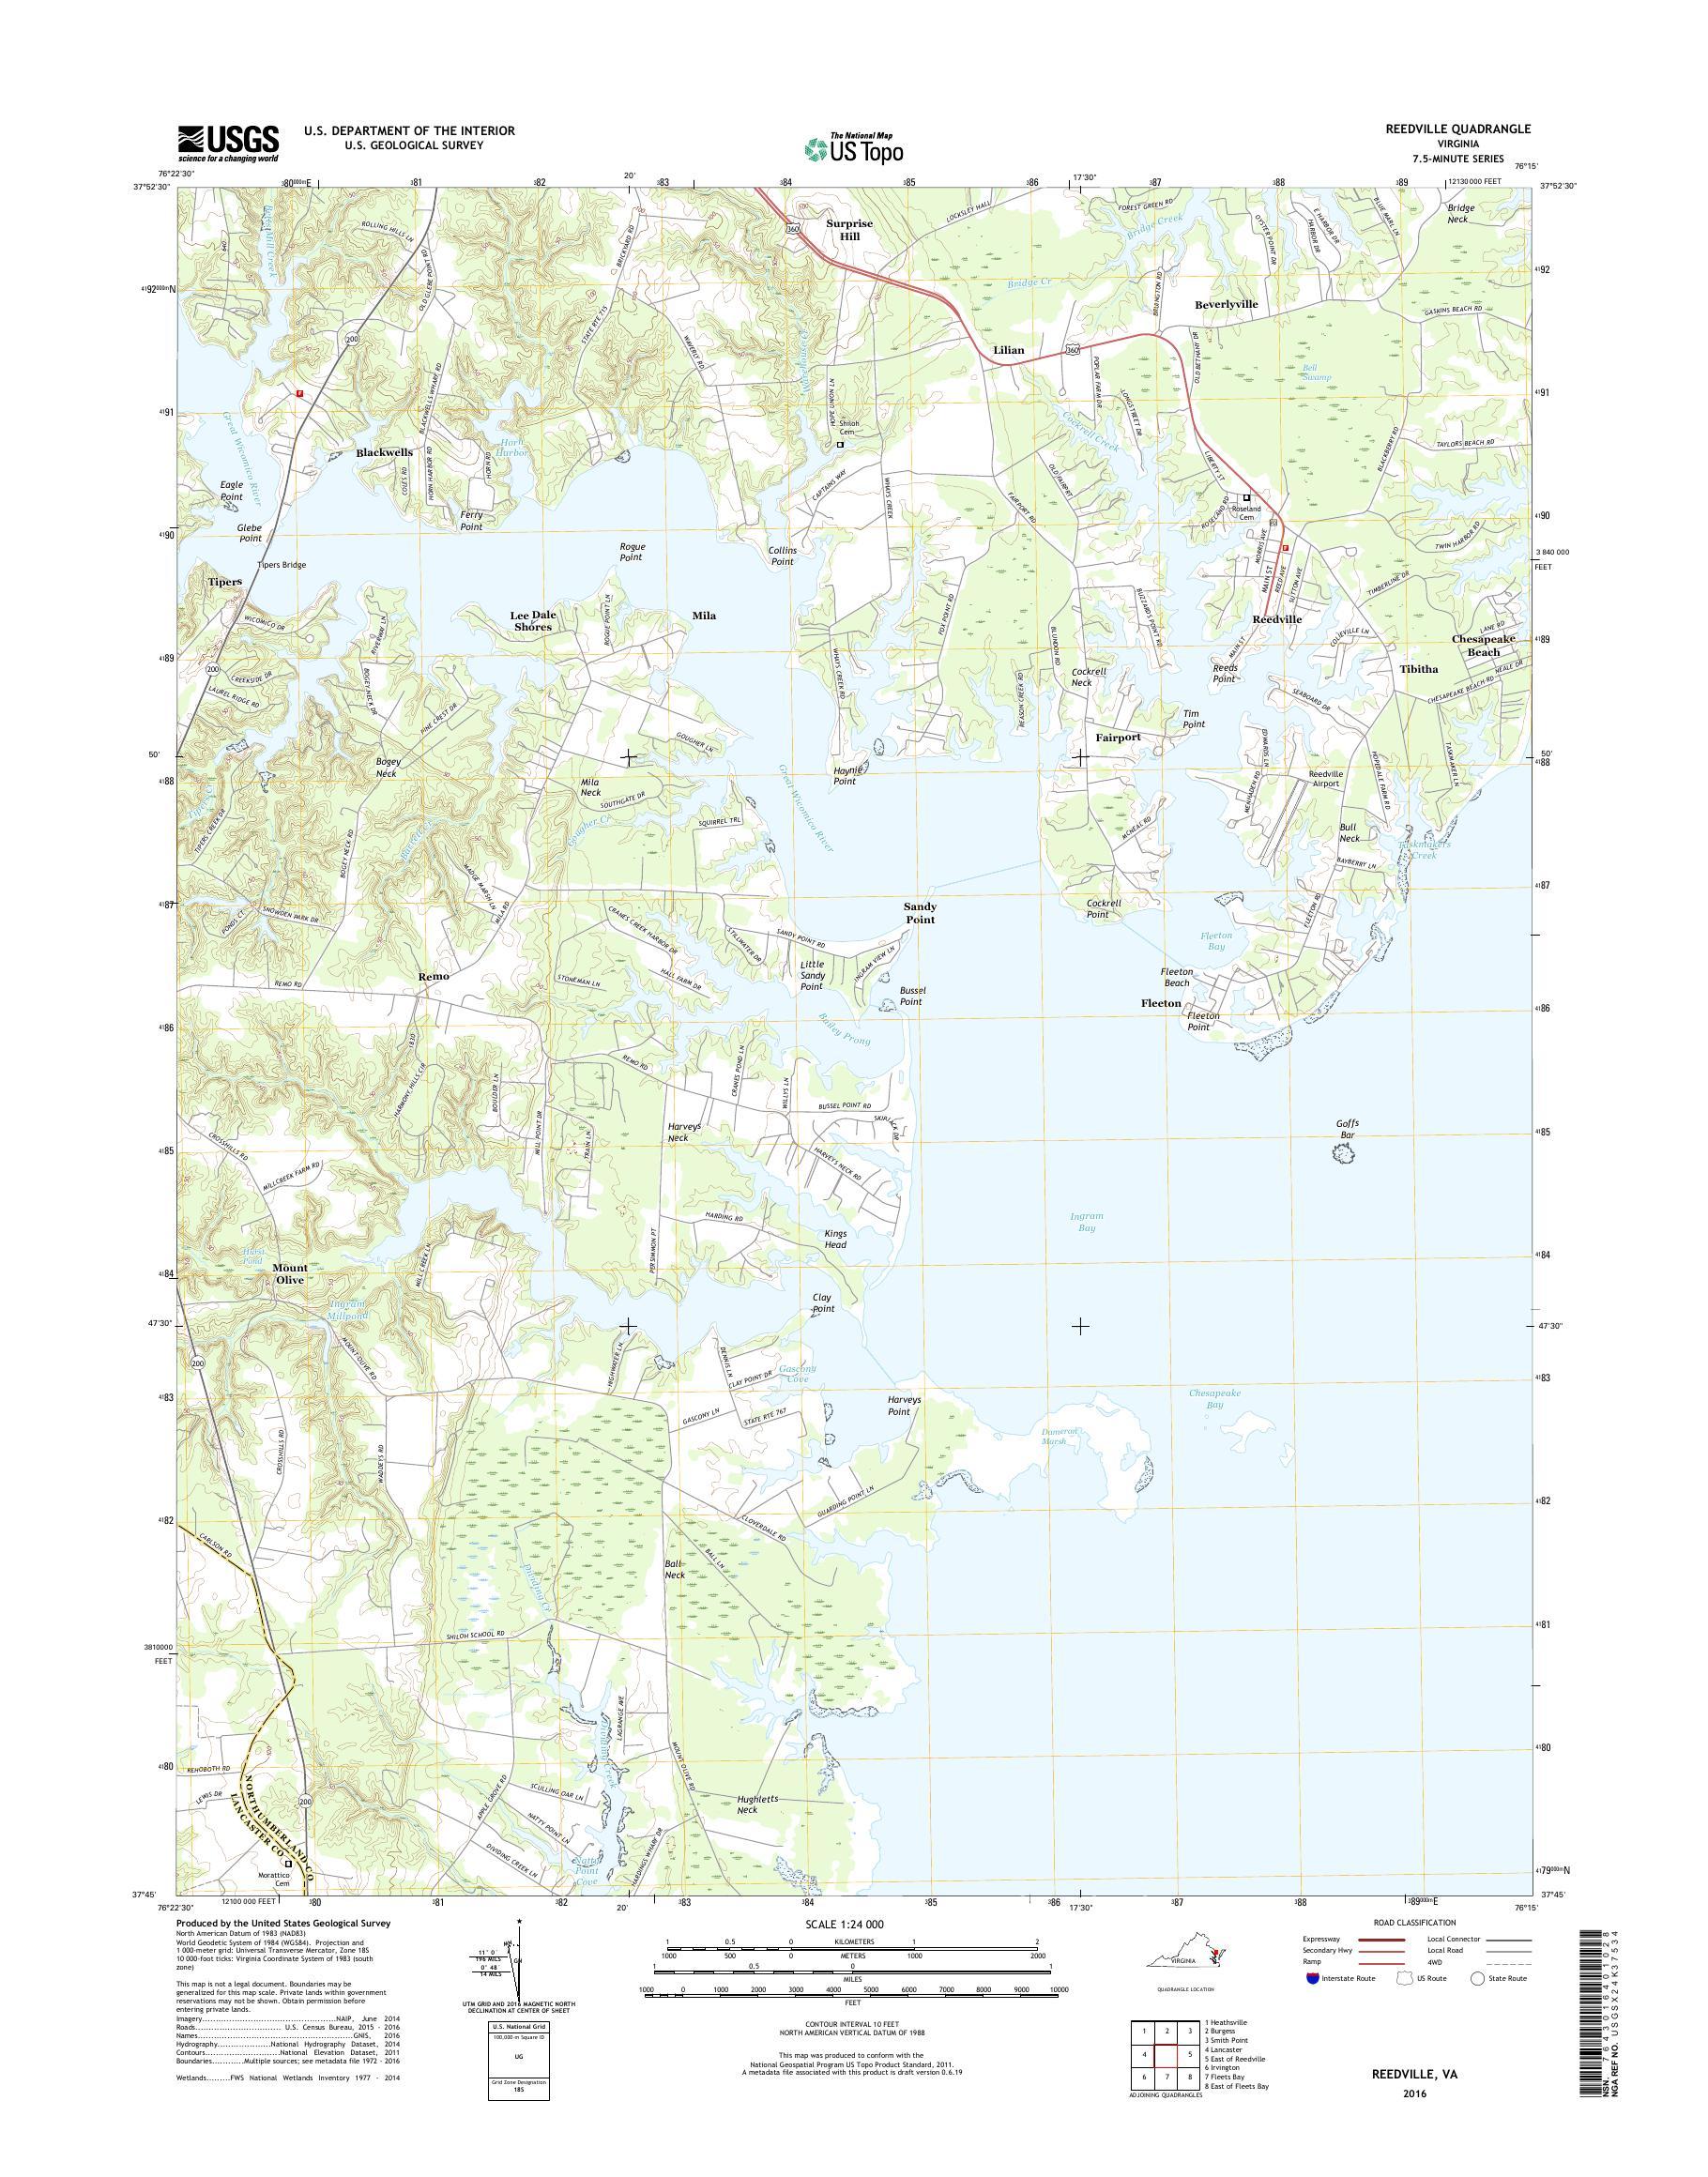 Mytopo Reedville Virginia Usgs Quad Topo Map